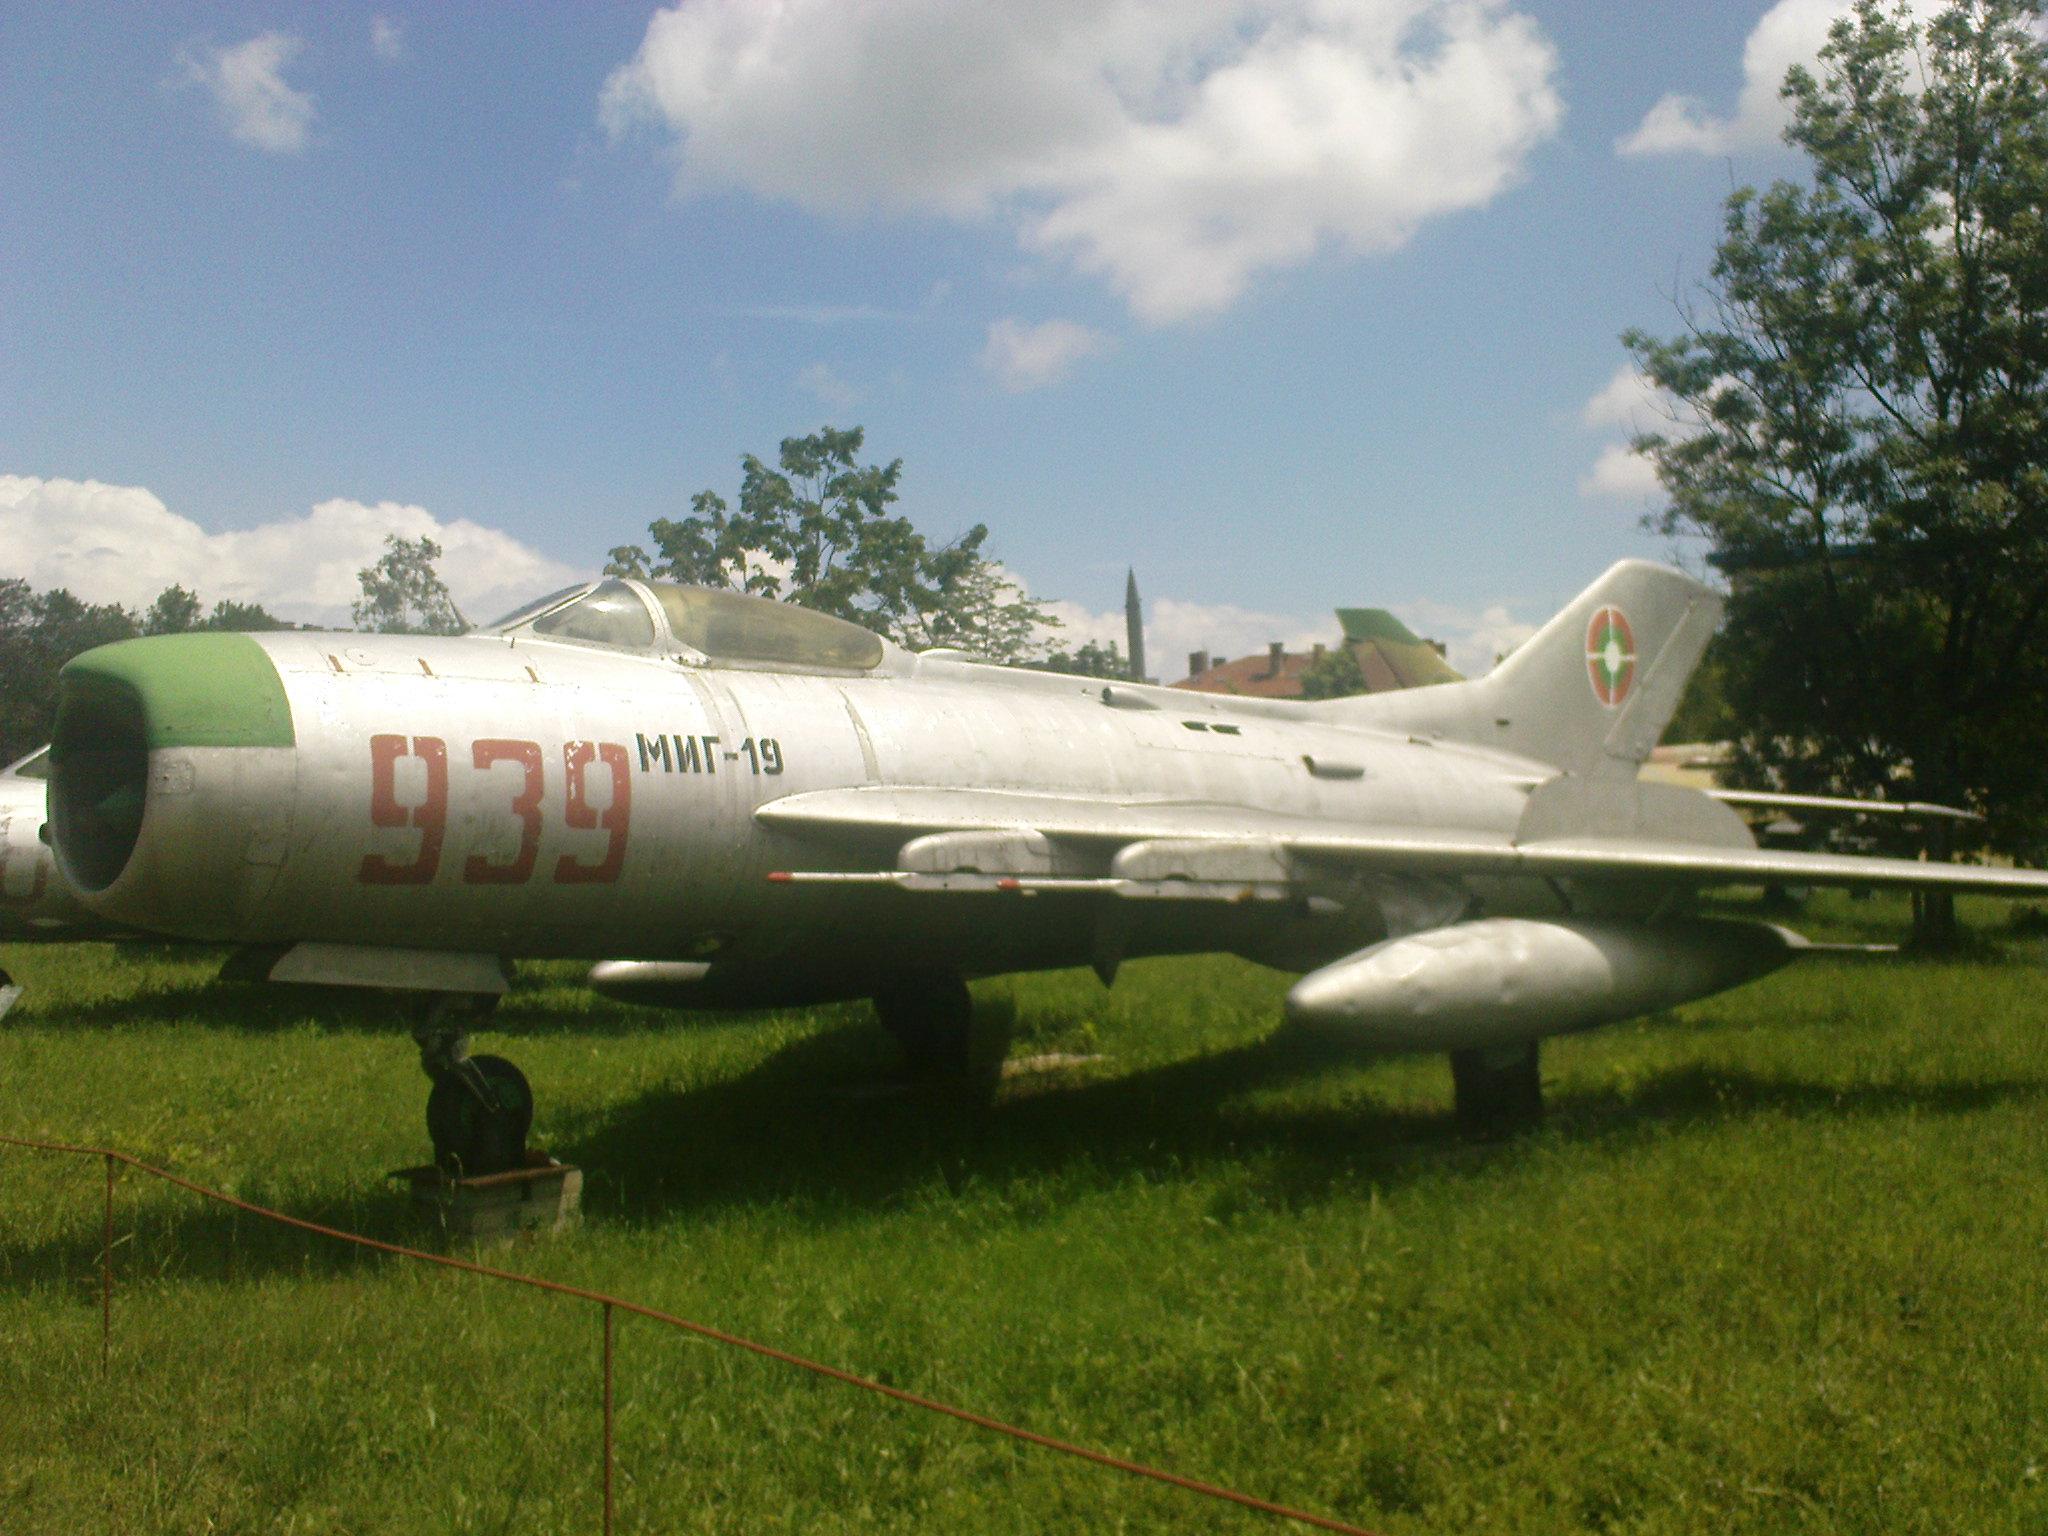 Mikoyan-Gurevich MiG-19 - Wikipedia